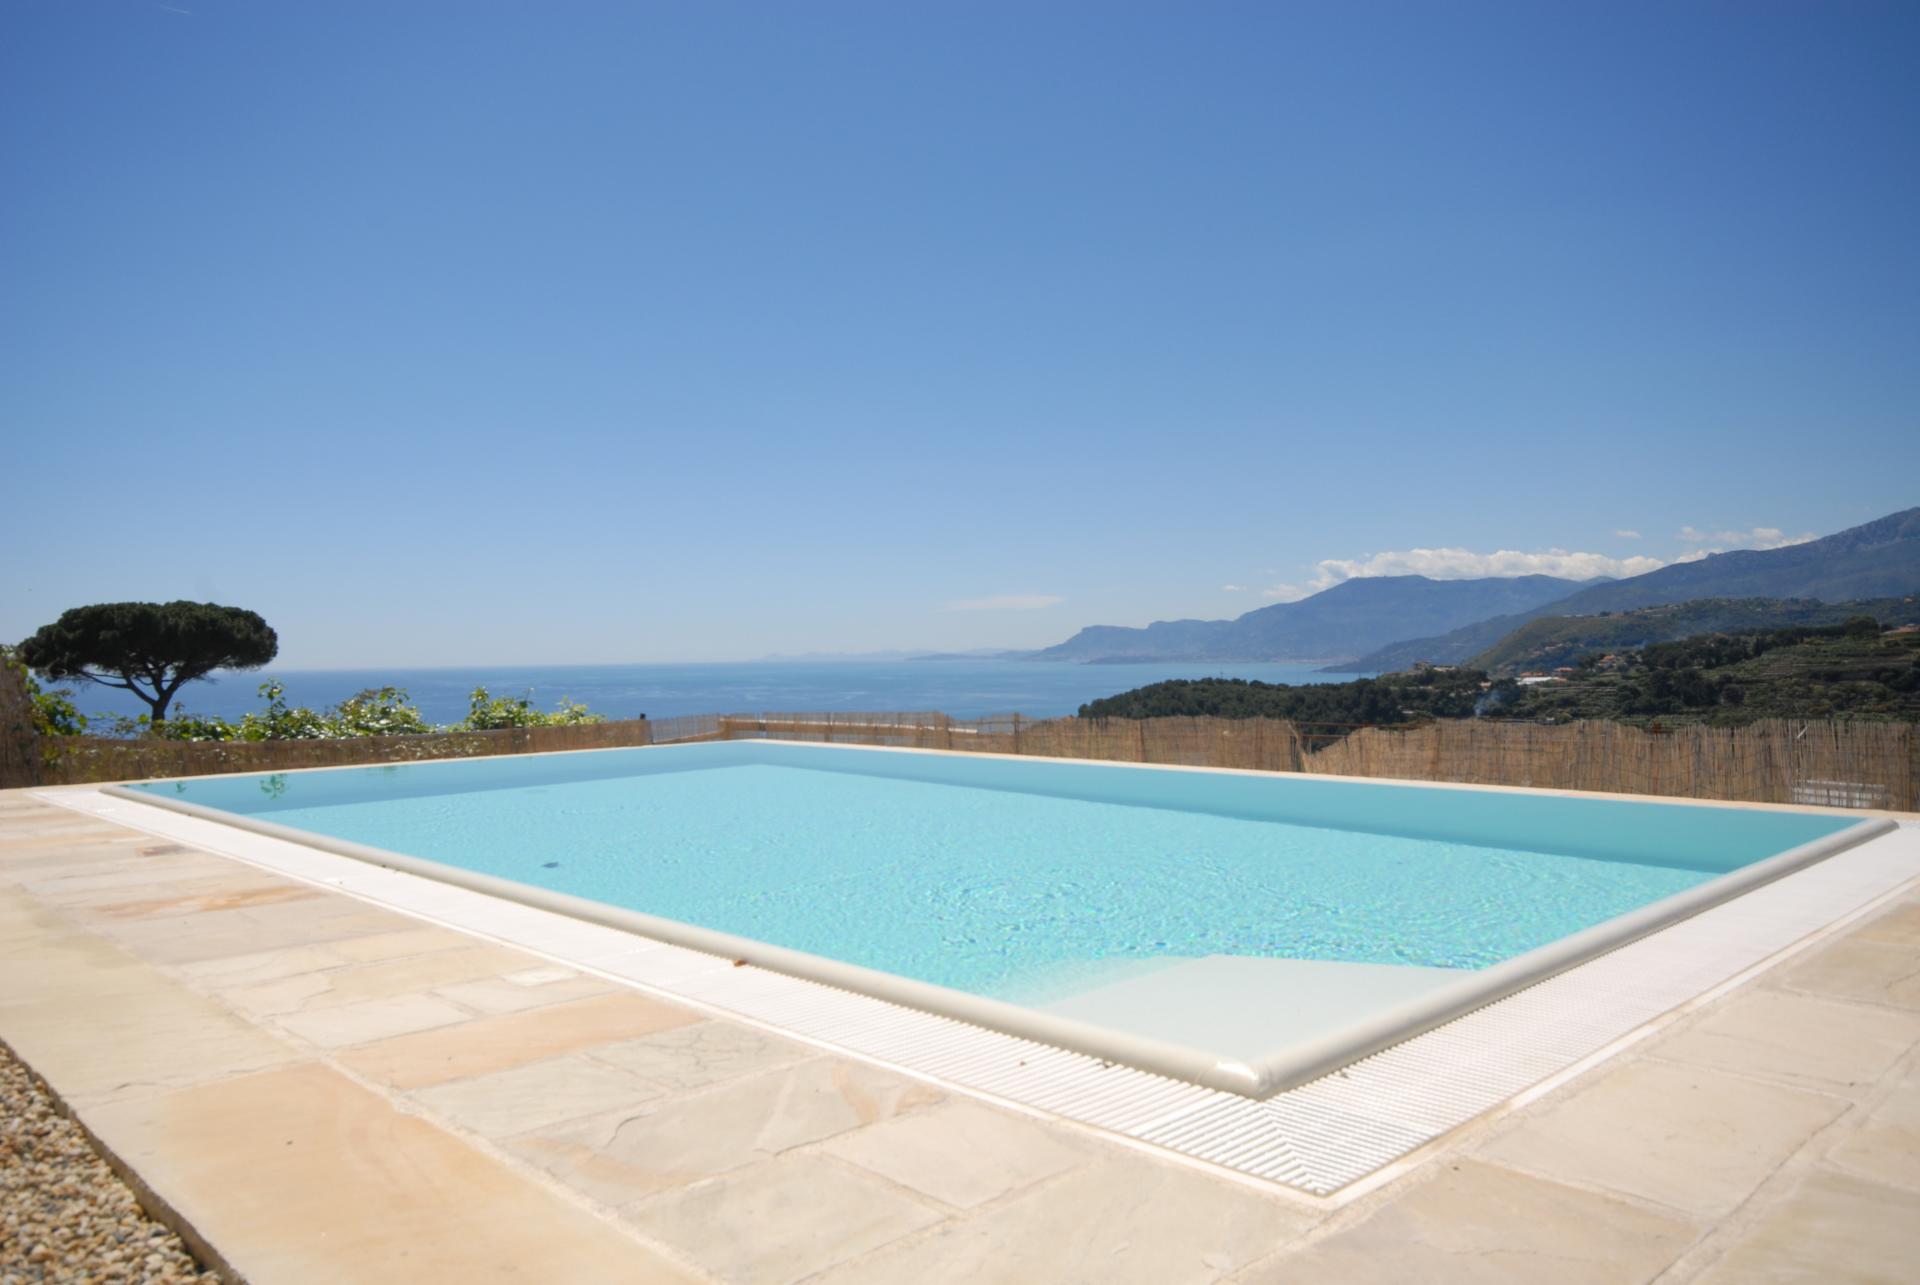 Villa Claudio Bordighera Liguria